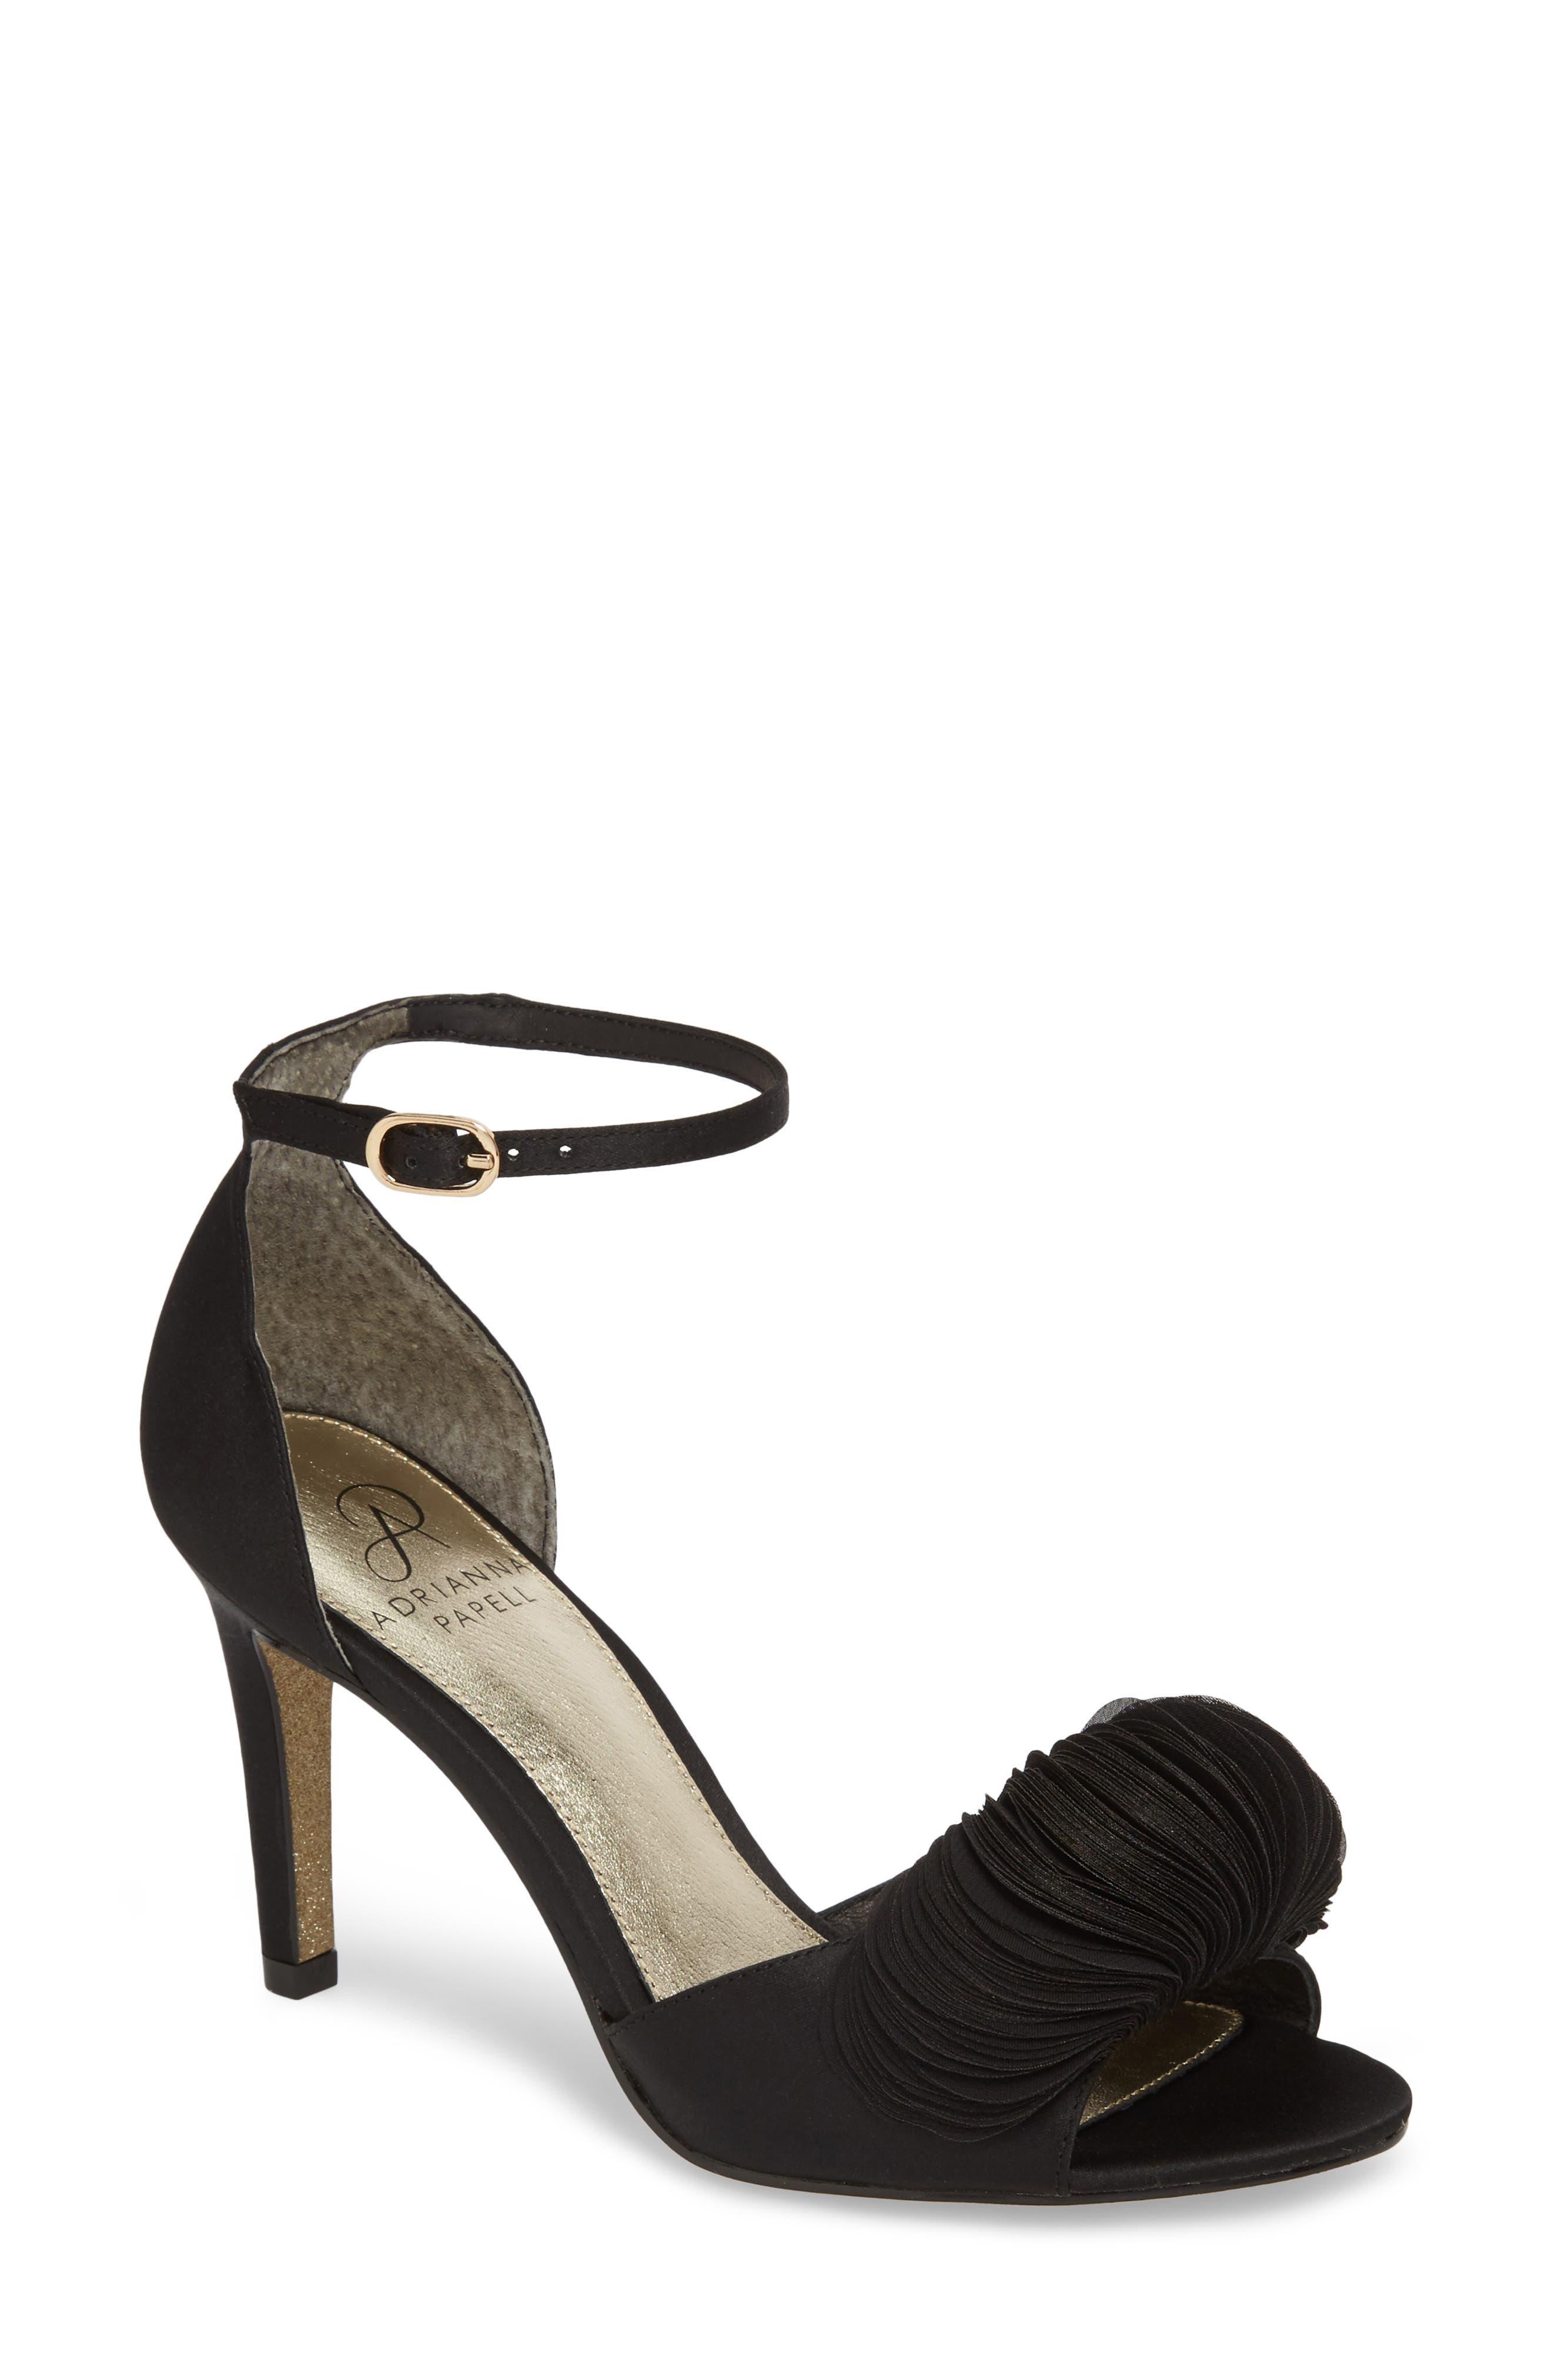 Gracie Ankle Strap Sandal,                         Main,                         color, BLACK FABRIC